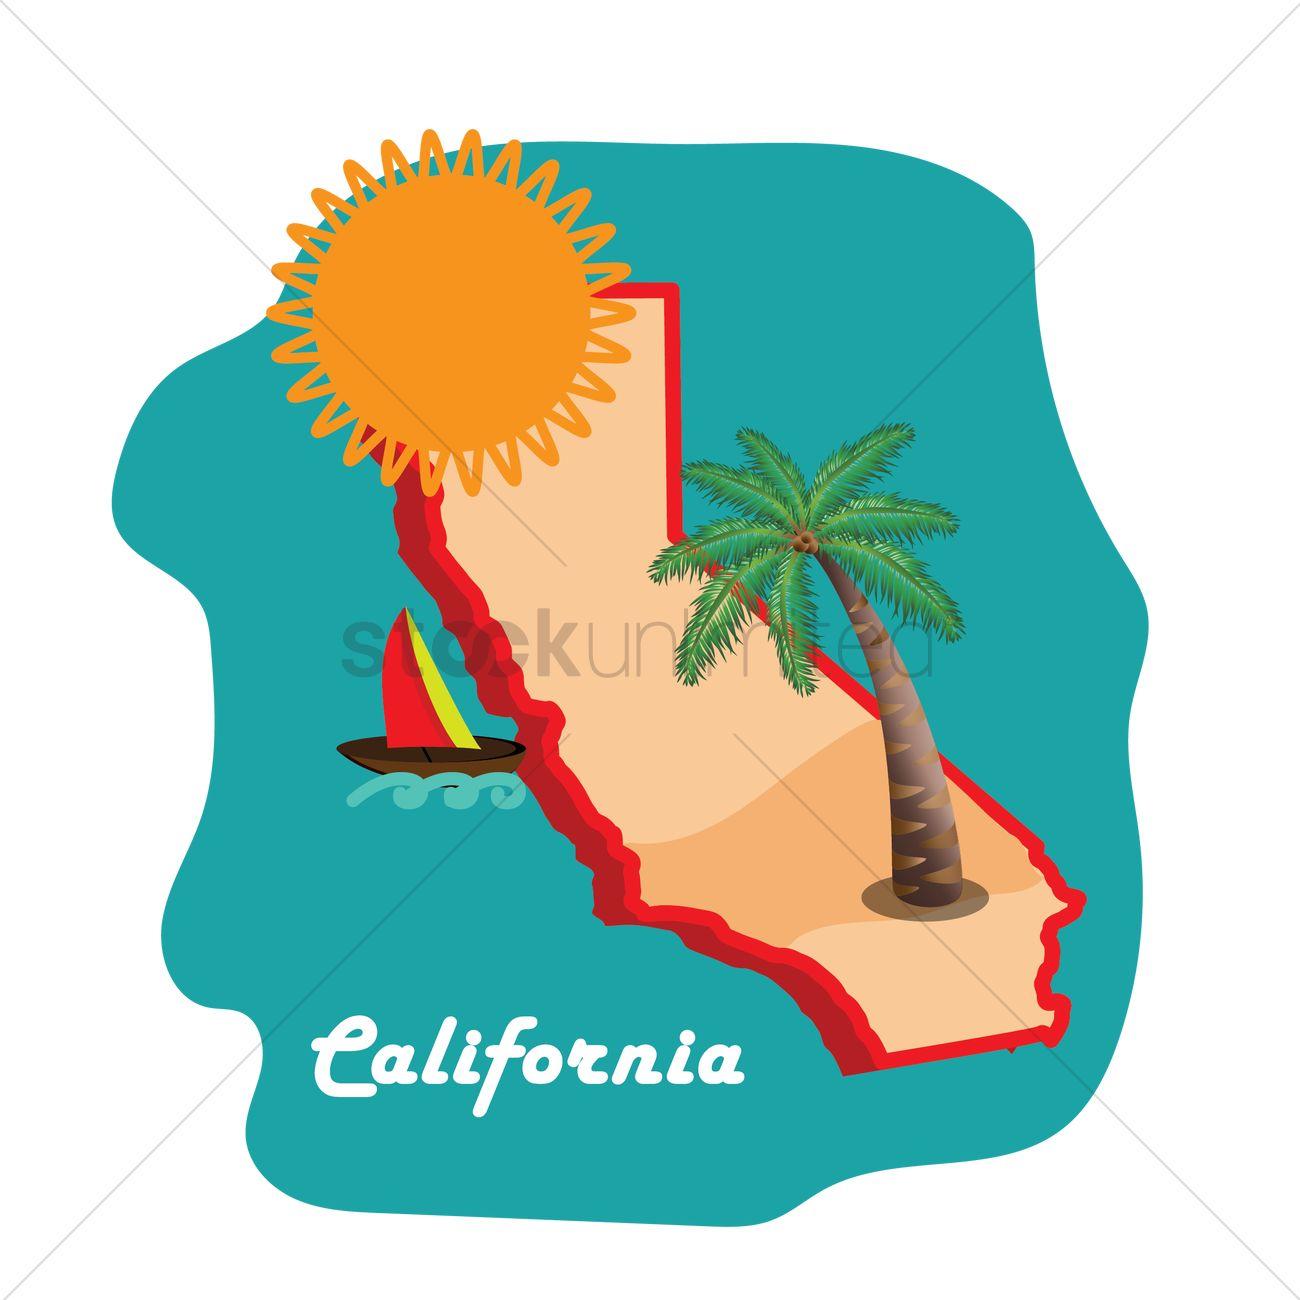 California state map with long beach Vector Image - 1591347 ... on santa ana california map, orange california map, malibu california map, irvine california map, bay area california map, seattle washington map, fresno california map, los angeles california map, santa barbara map, california beaches map, san diego california map, monterey california map, palm springs california map, san jose california map, bakersfield california map, san pedro california map, mapquest california map, la california map, lawndale california map, fullerton california map,